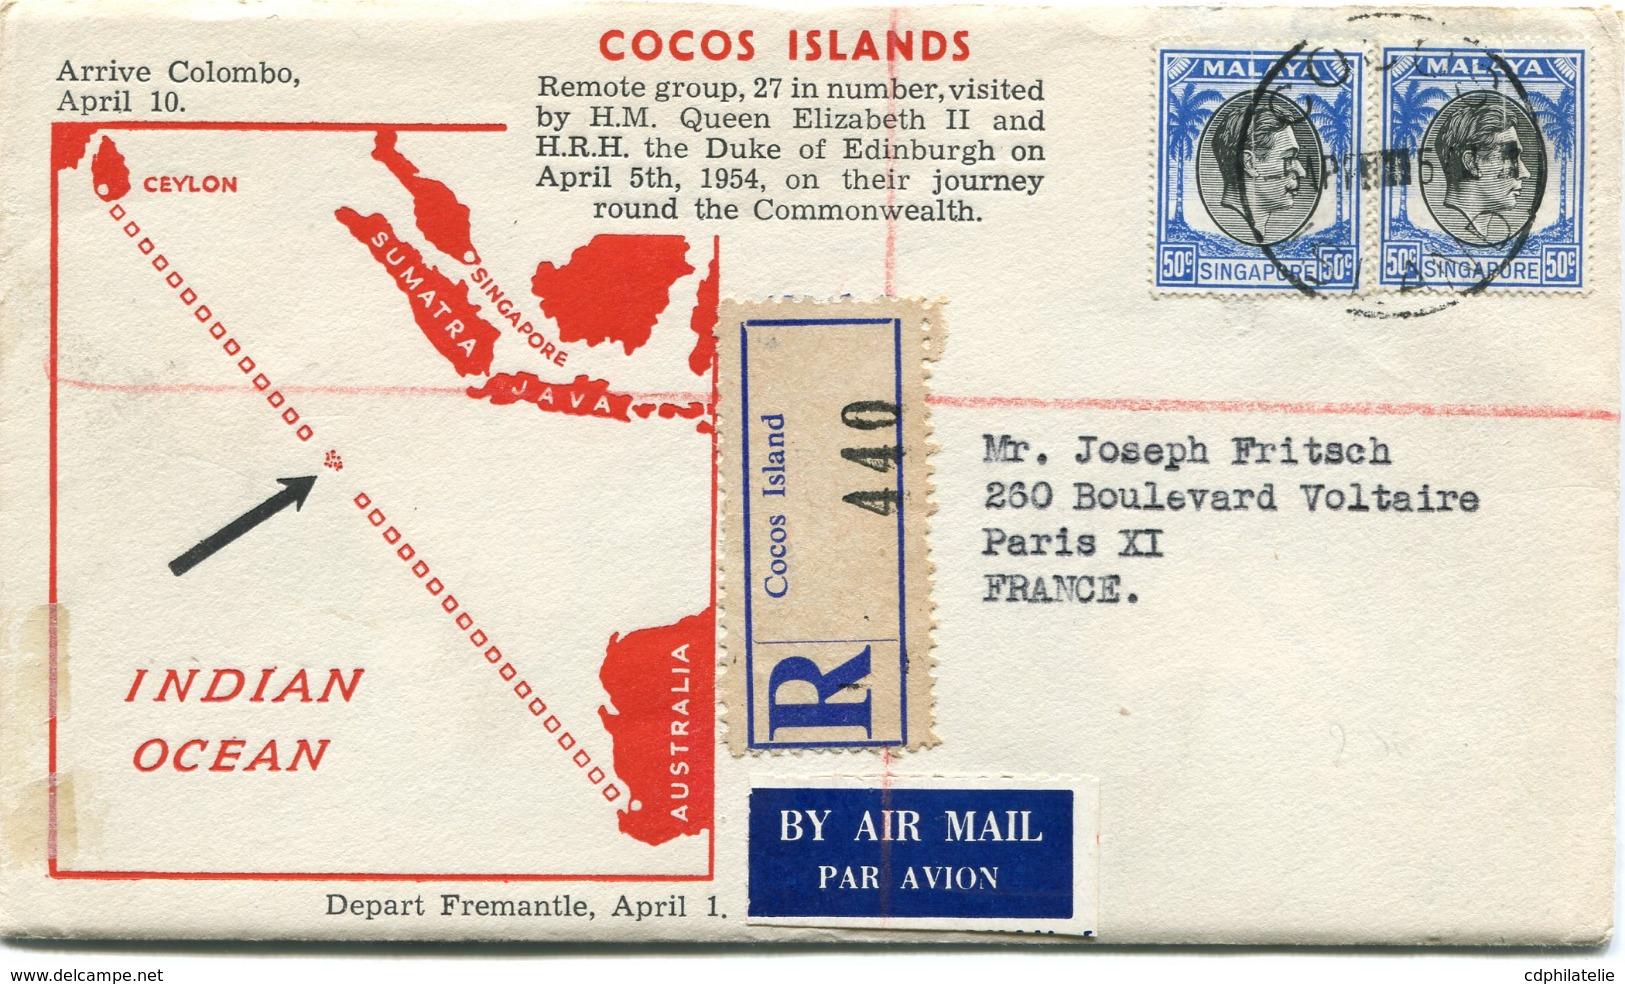 "COCOS ISLANDS ENVELOPPE RECOMMANDEE PAR AVION ""VISITE DE LA REINE ELISABETH II...."" DEPART COCOS 5 APR 54 POUR LA FRANCE - Cocos (Keeling) Islands"